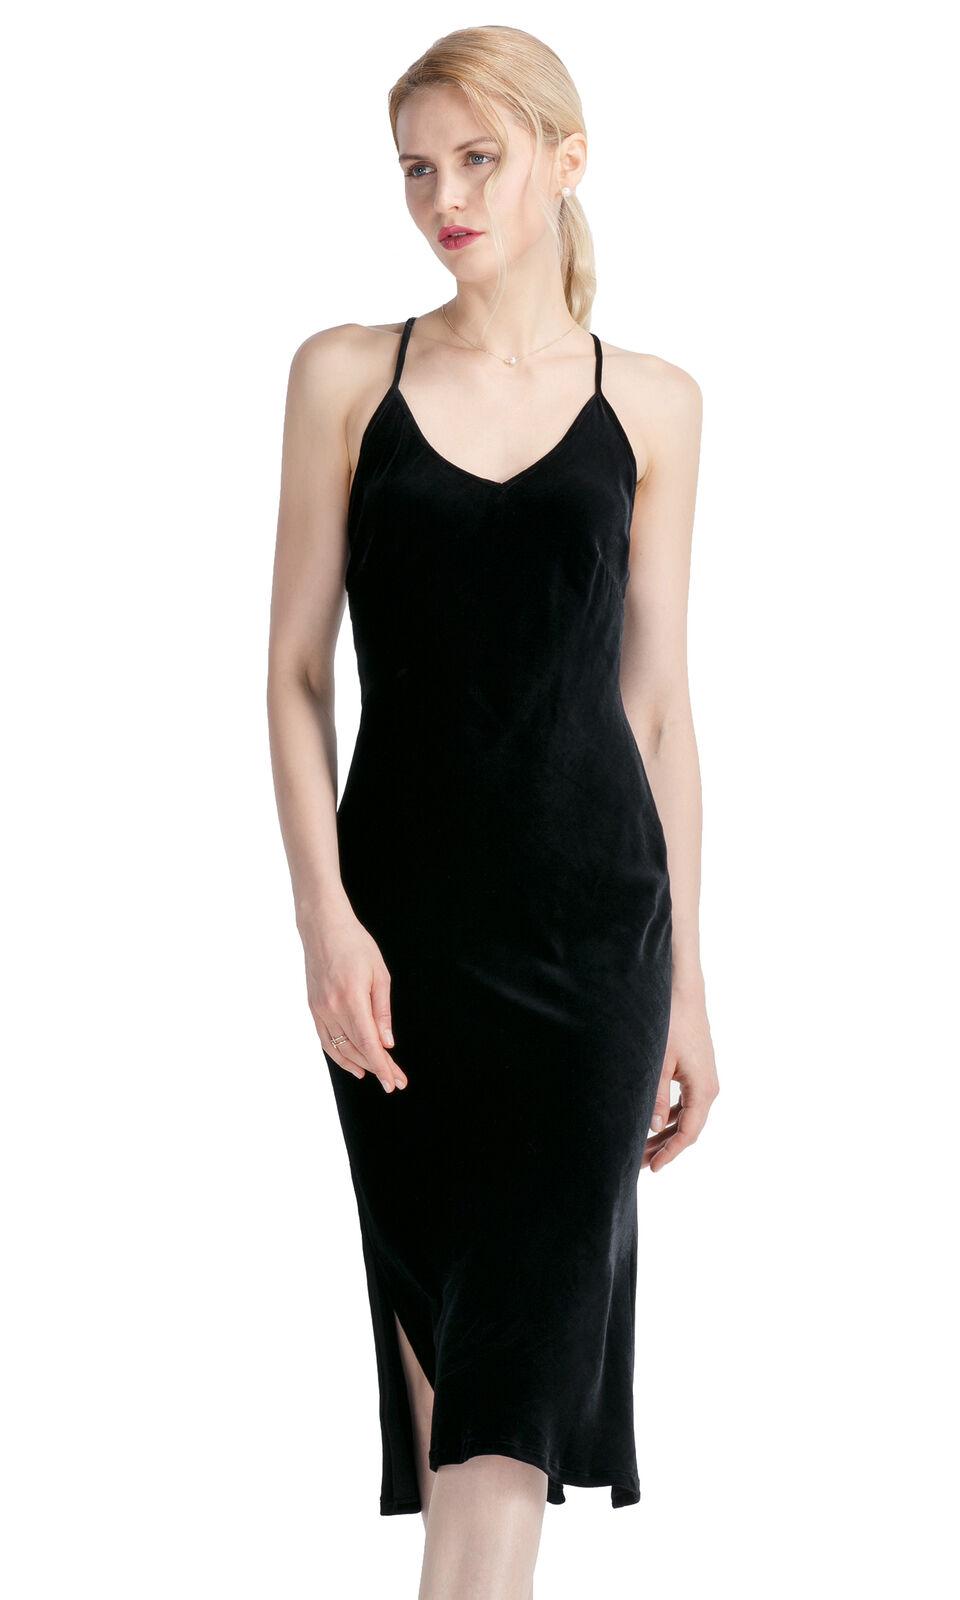 LILYSILK Silk Dress for Women Super Hot Hot Hot Silk Party Evening Dress Spaghetti Strap 420459